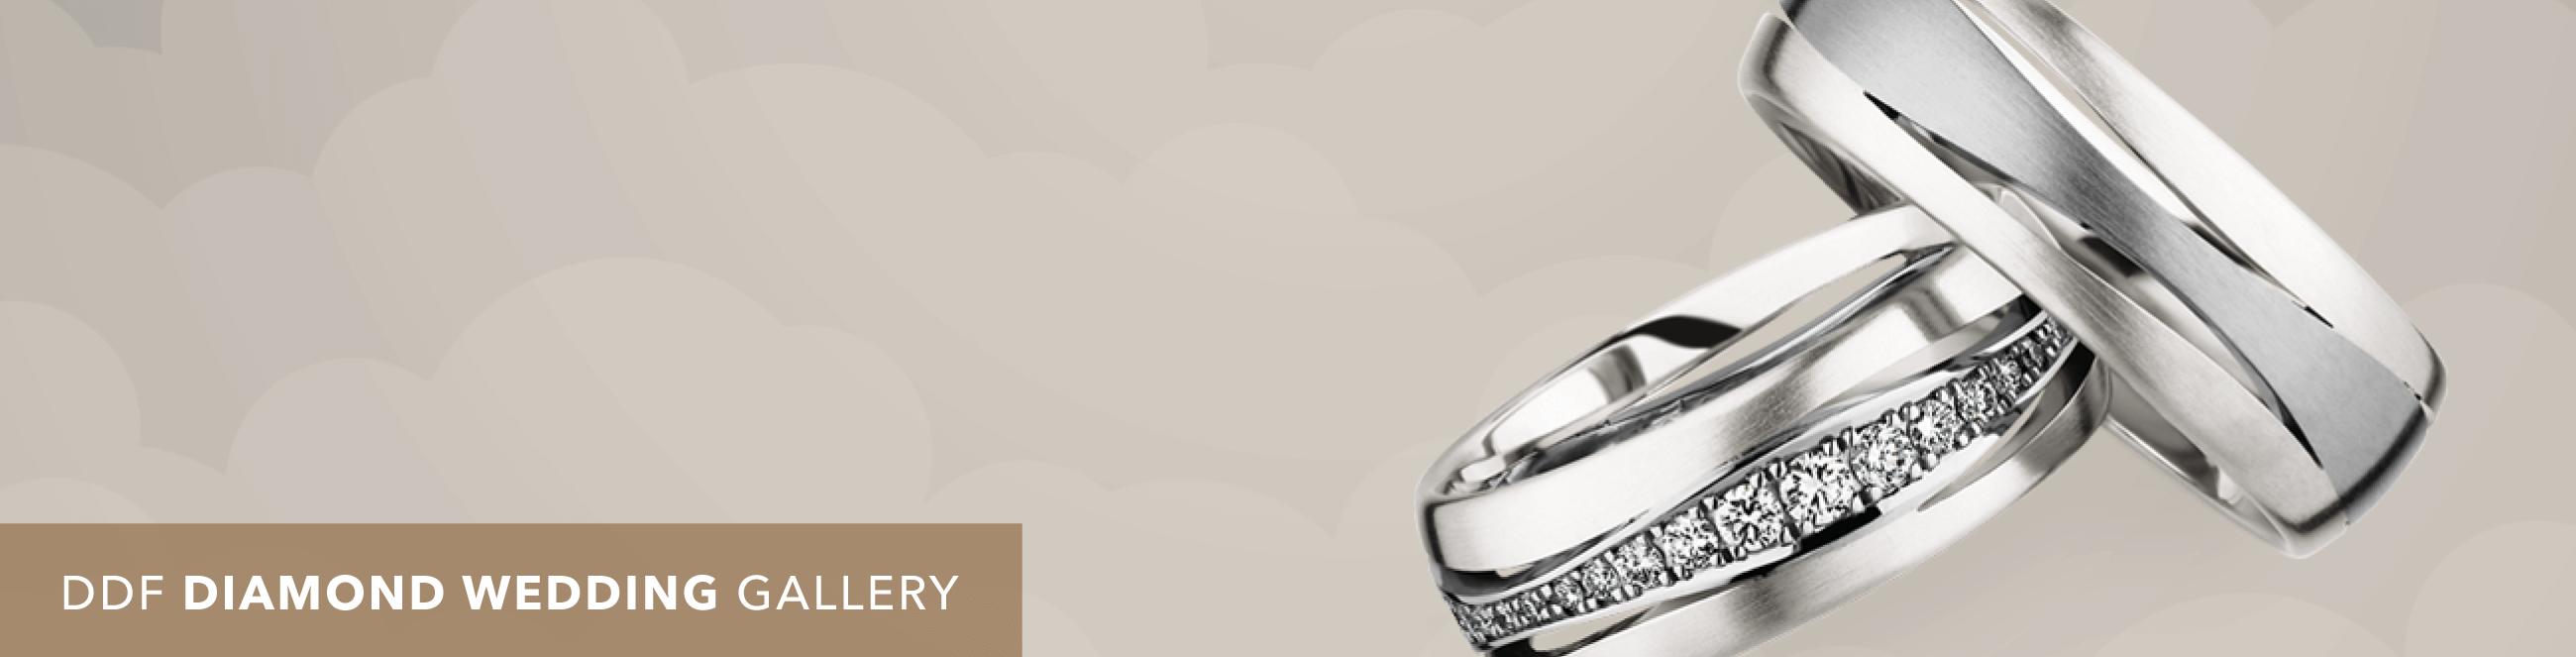 Wedding Rings Dublin